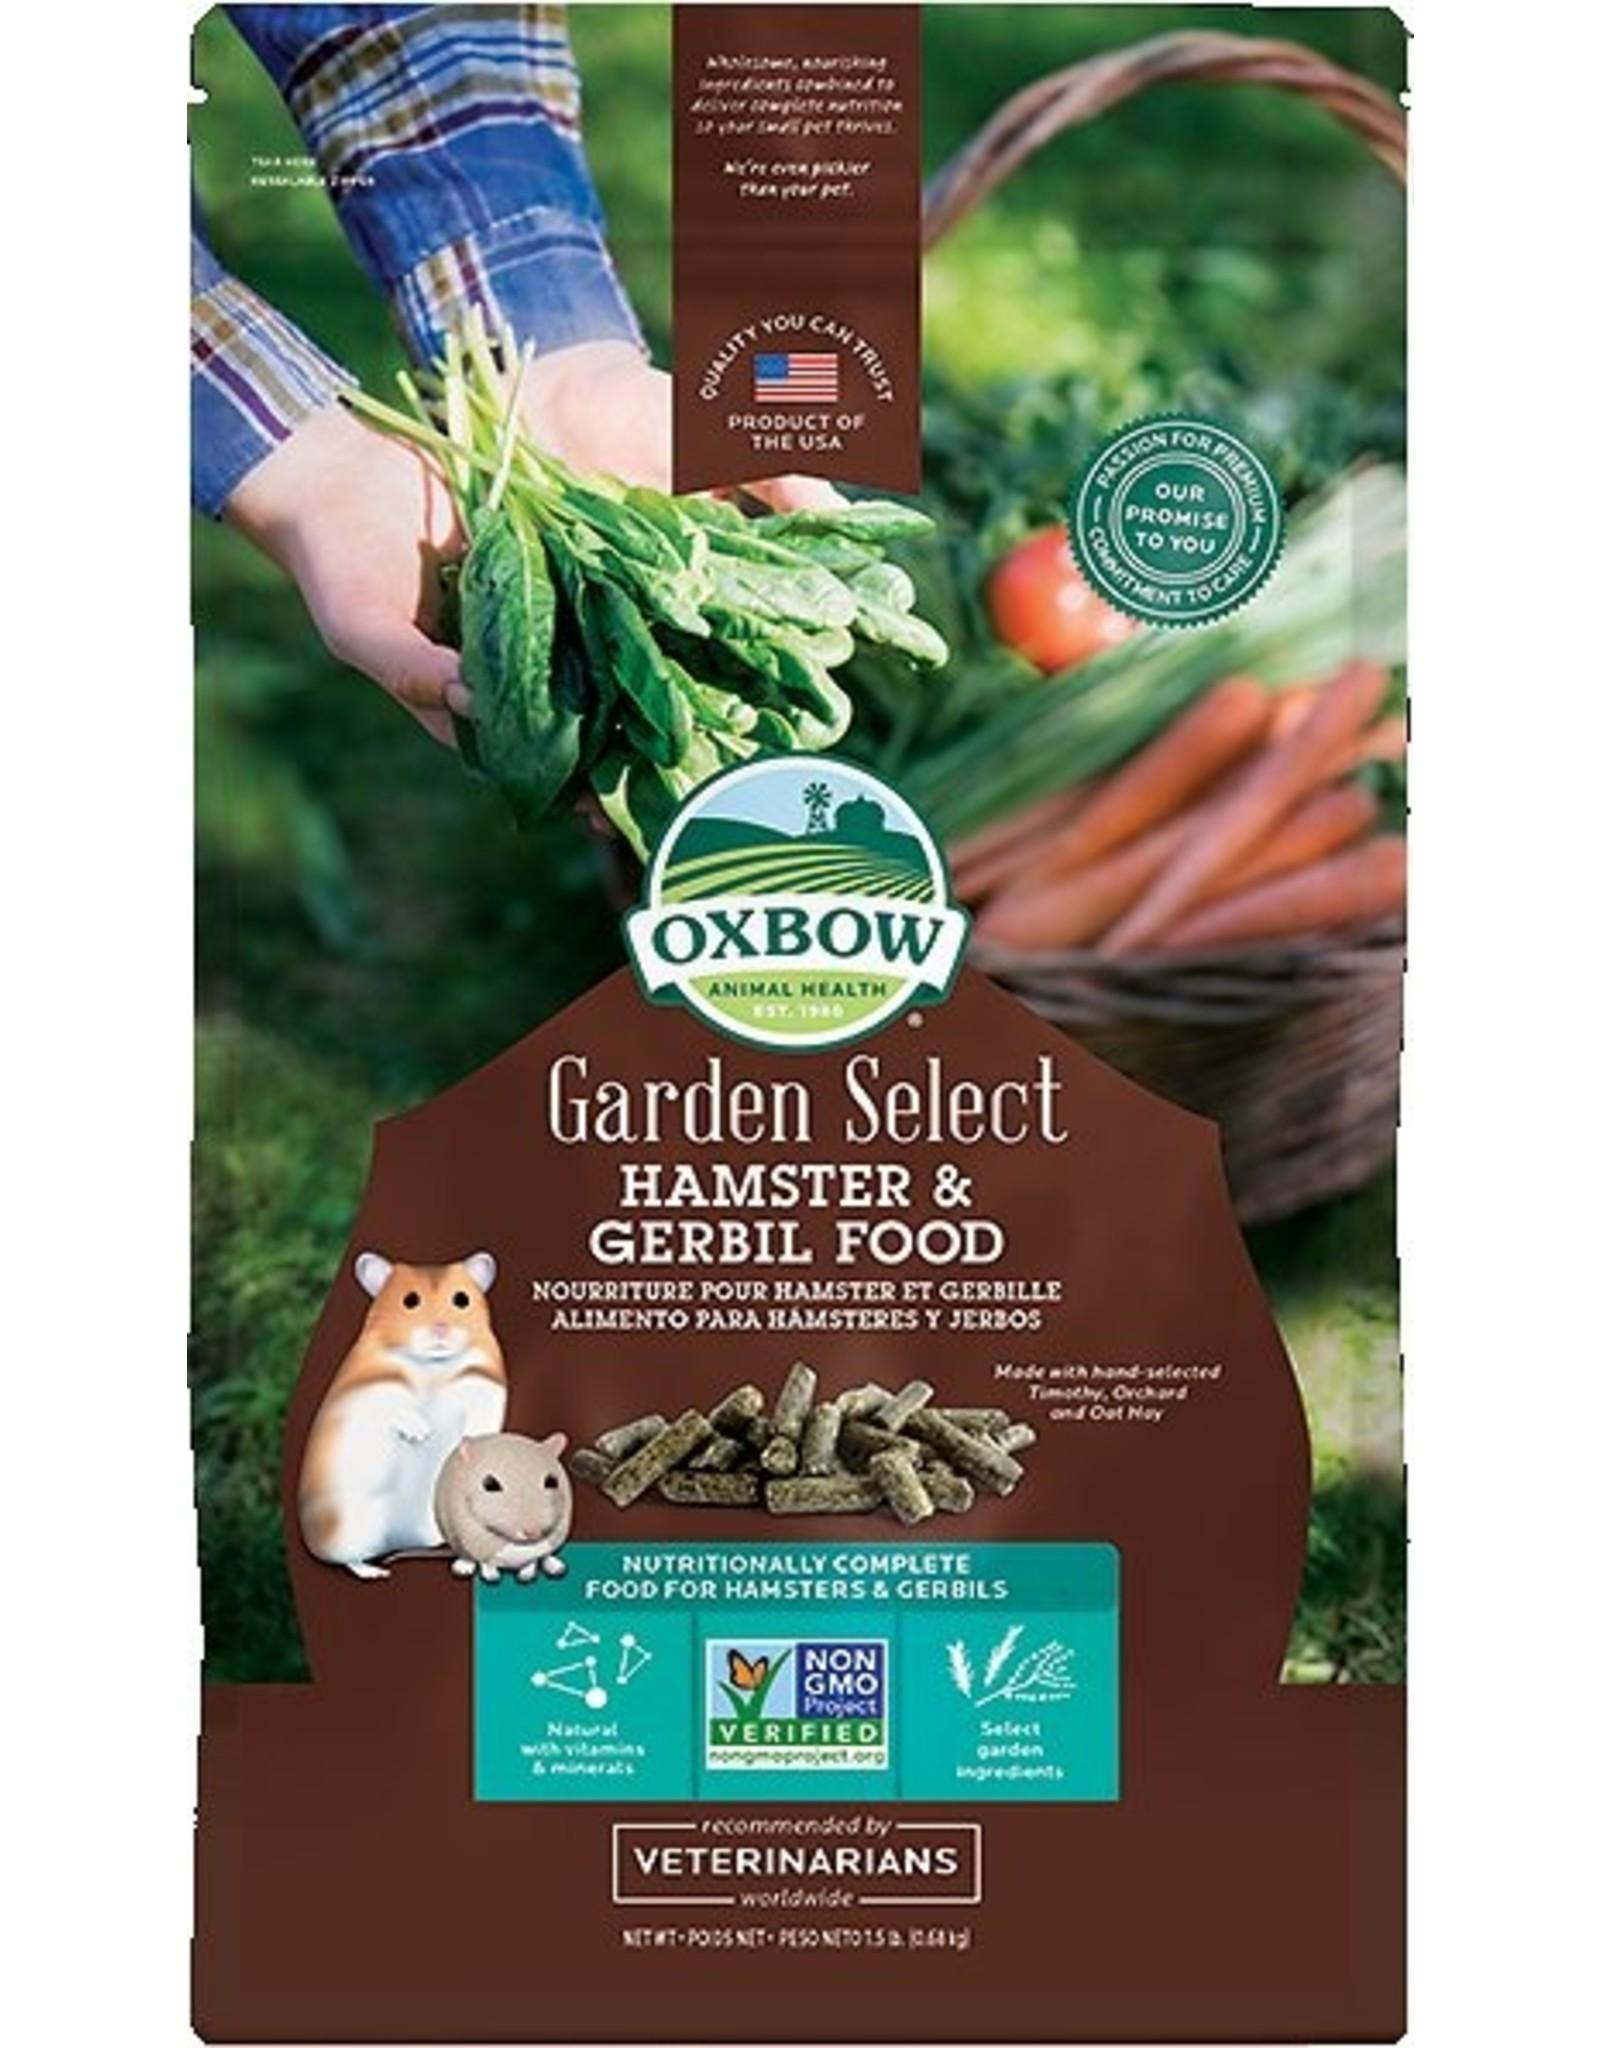 Oxbow Animal Health OXBOW GARDEN SELECT HAMSTER & GERBIL FOOD 1.5LB